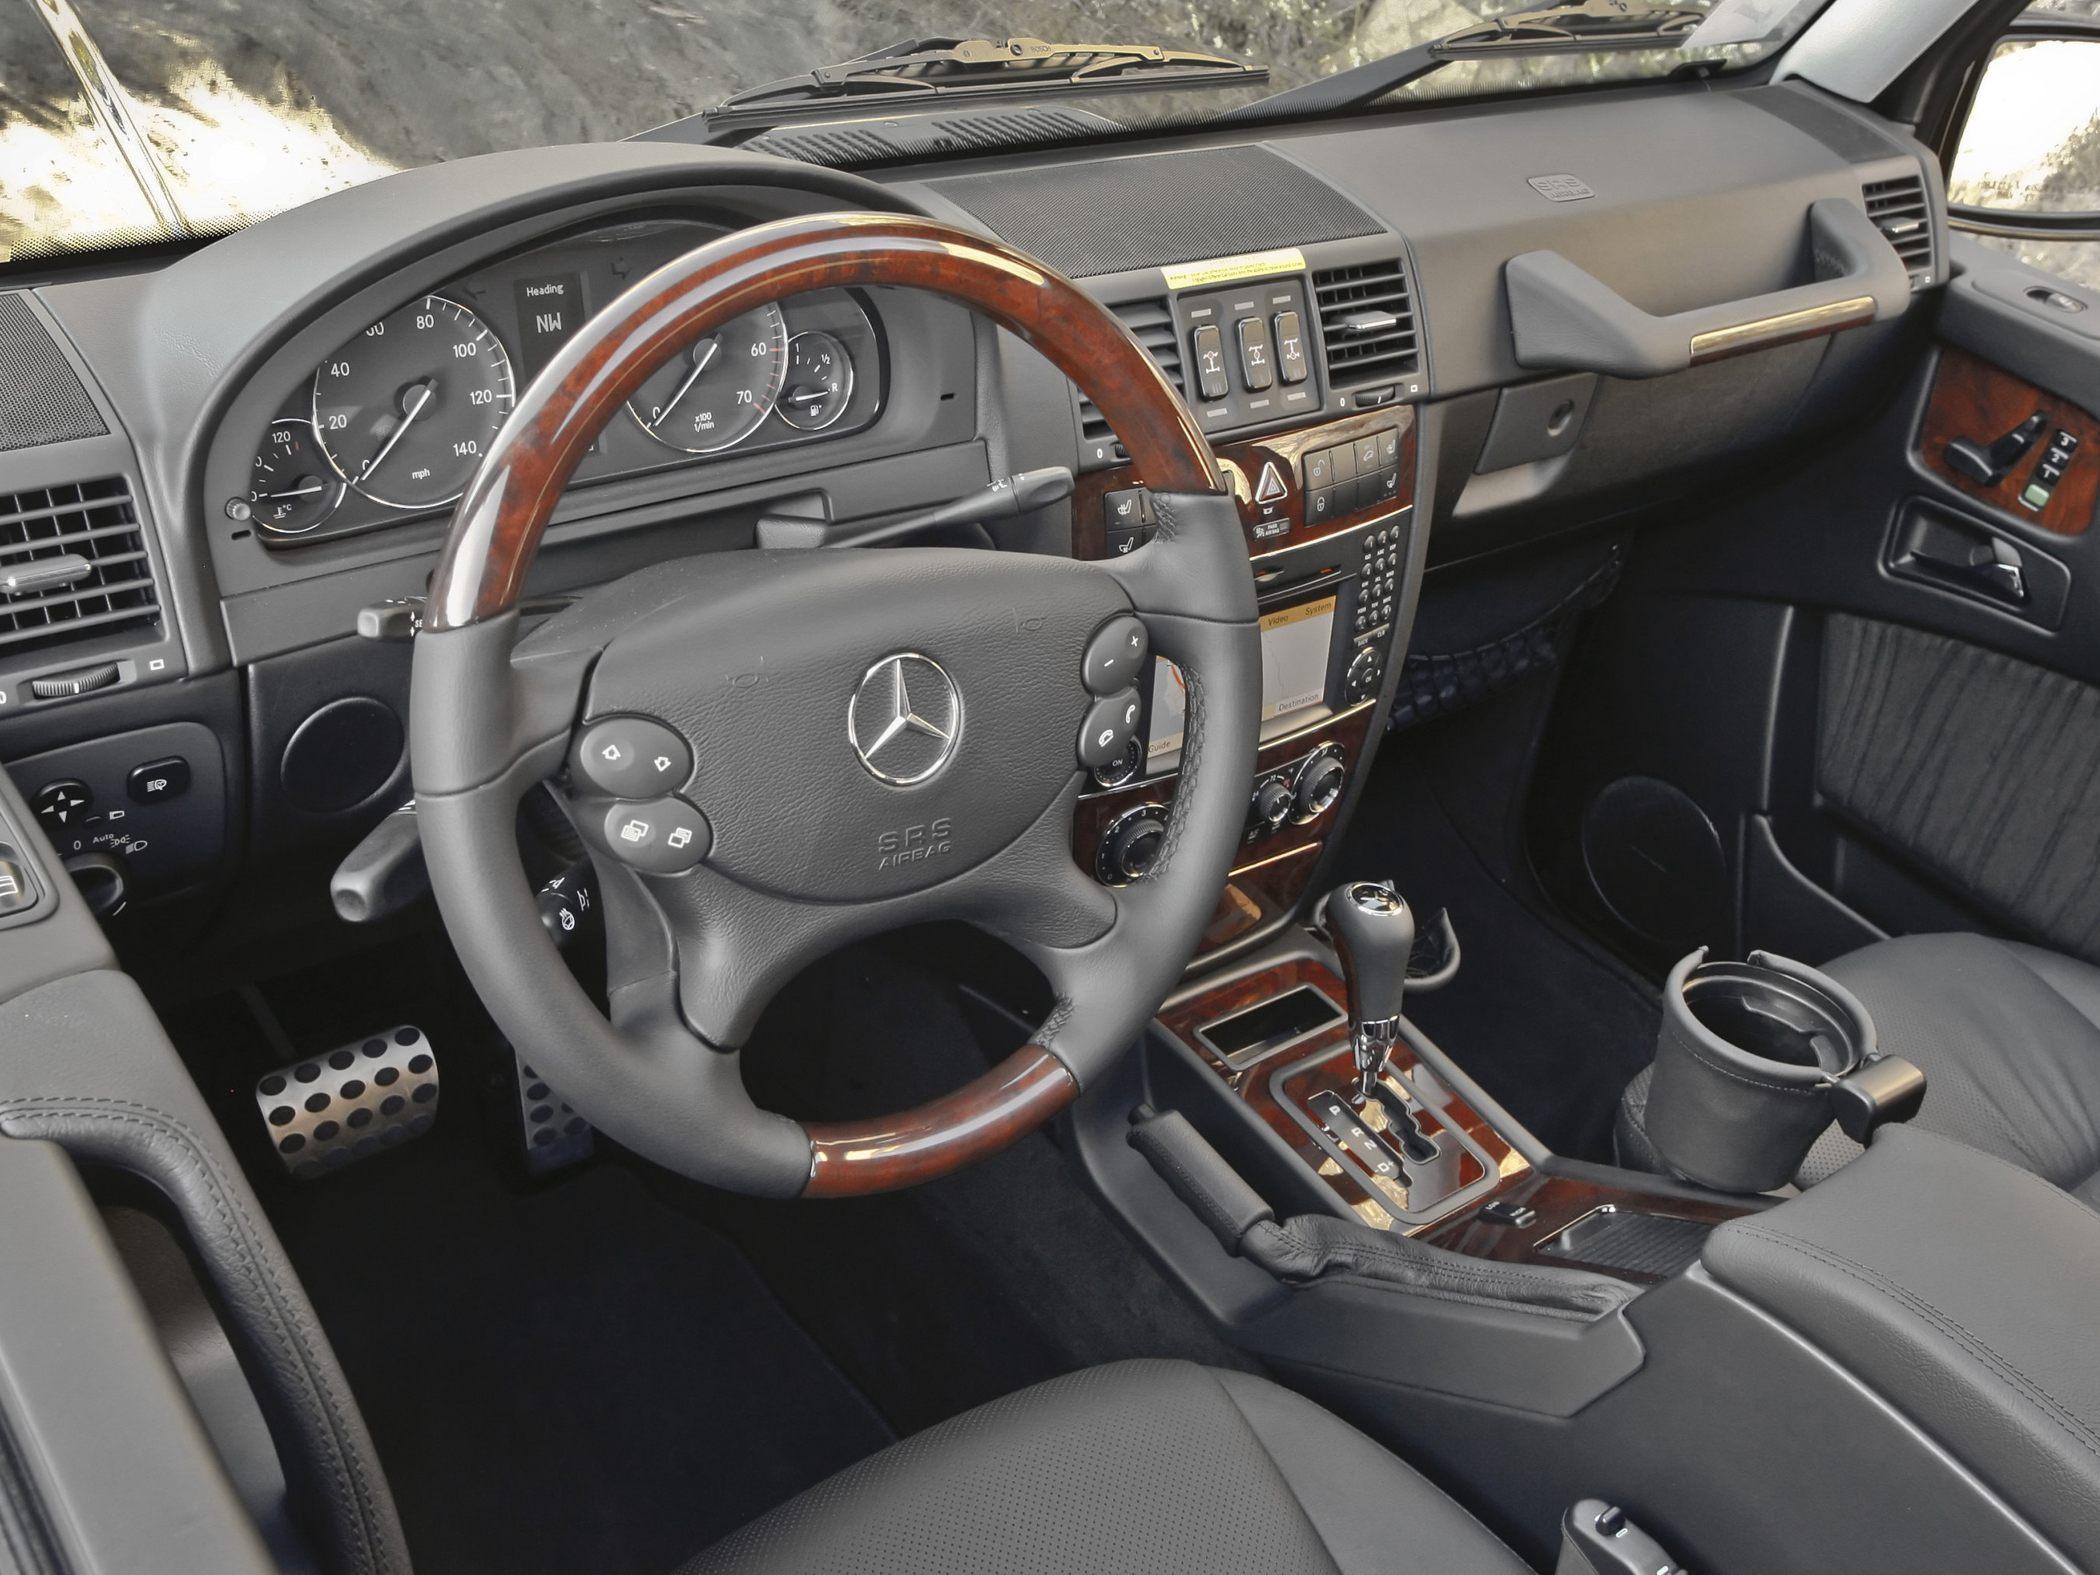 silver 2010 mercedes benz g class - G Wagon Matte Black Interior